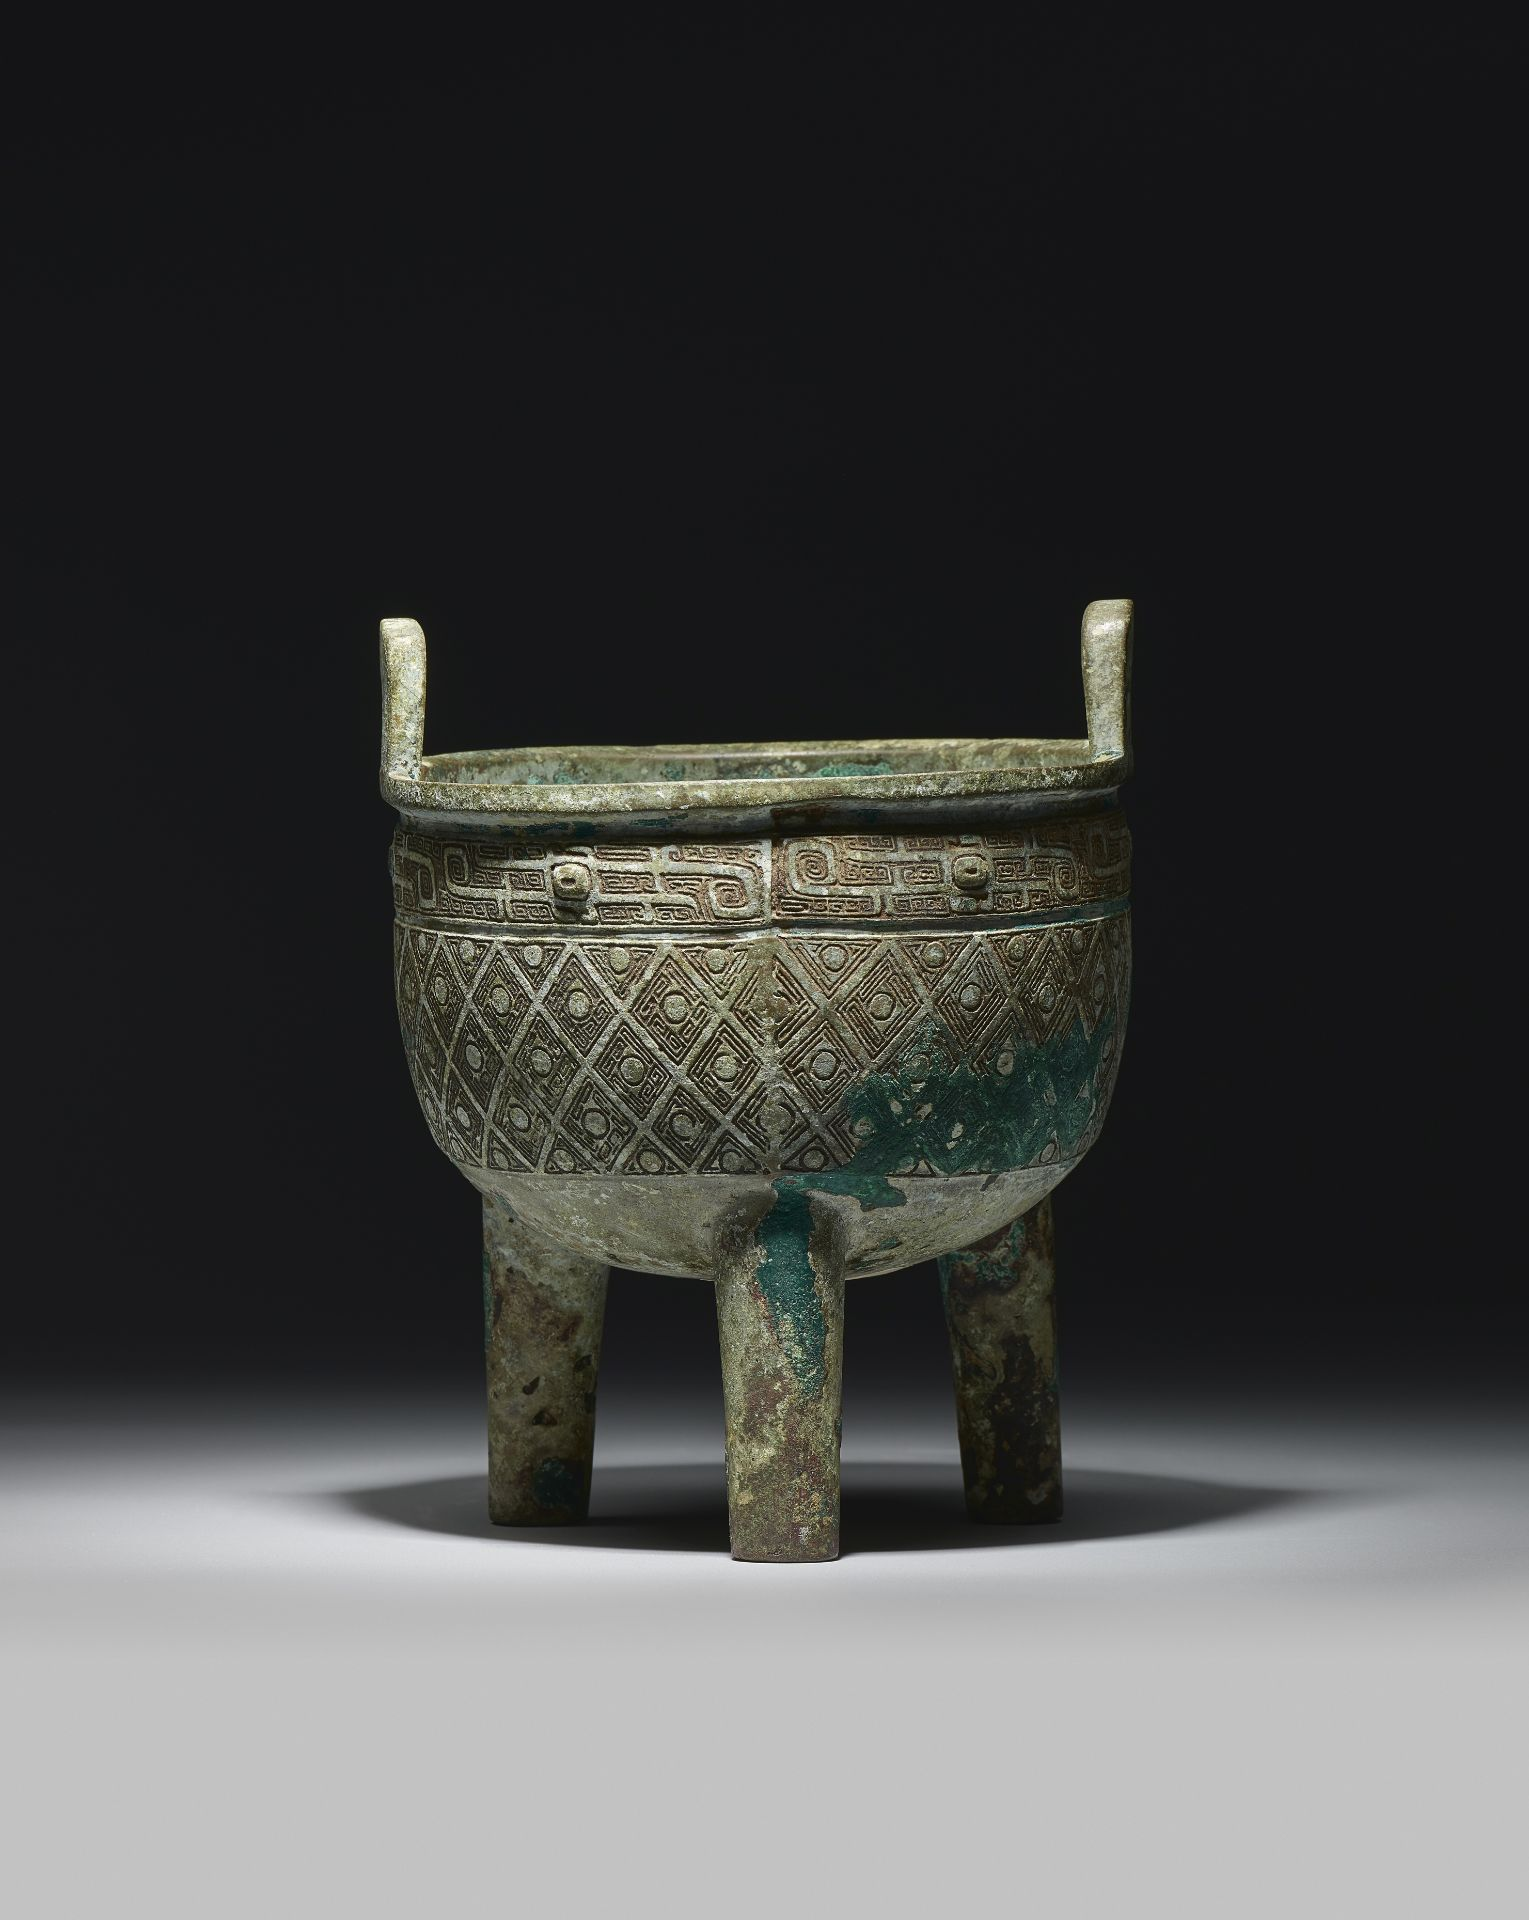 A RARE BRONZE RITUAL TRIPOD VESSEL, DING Early Western Zhou Dynasty